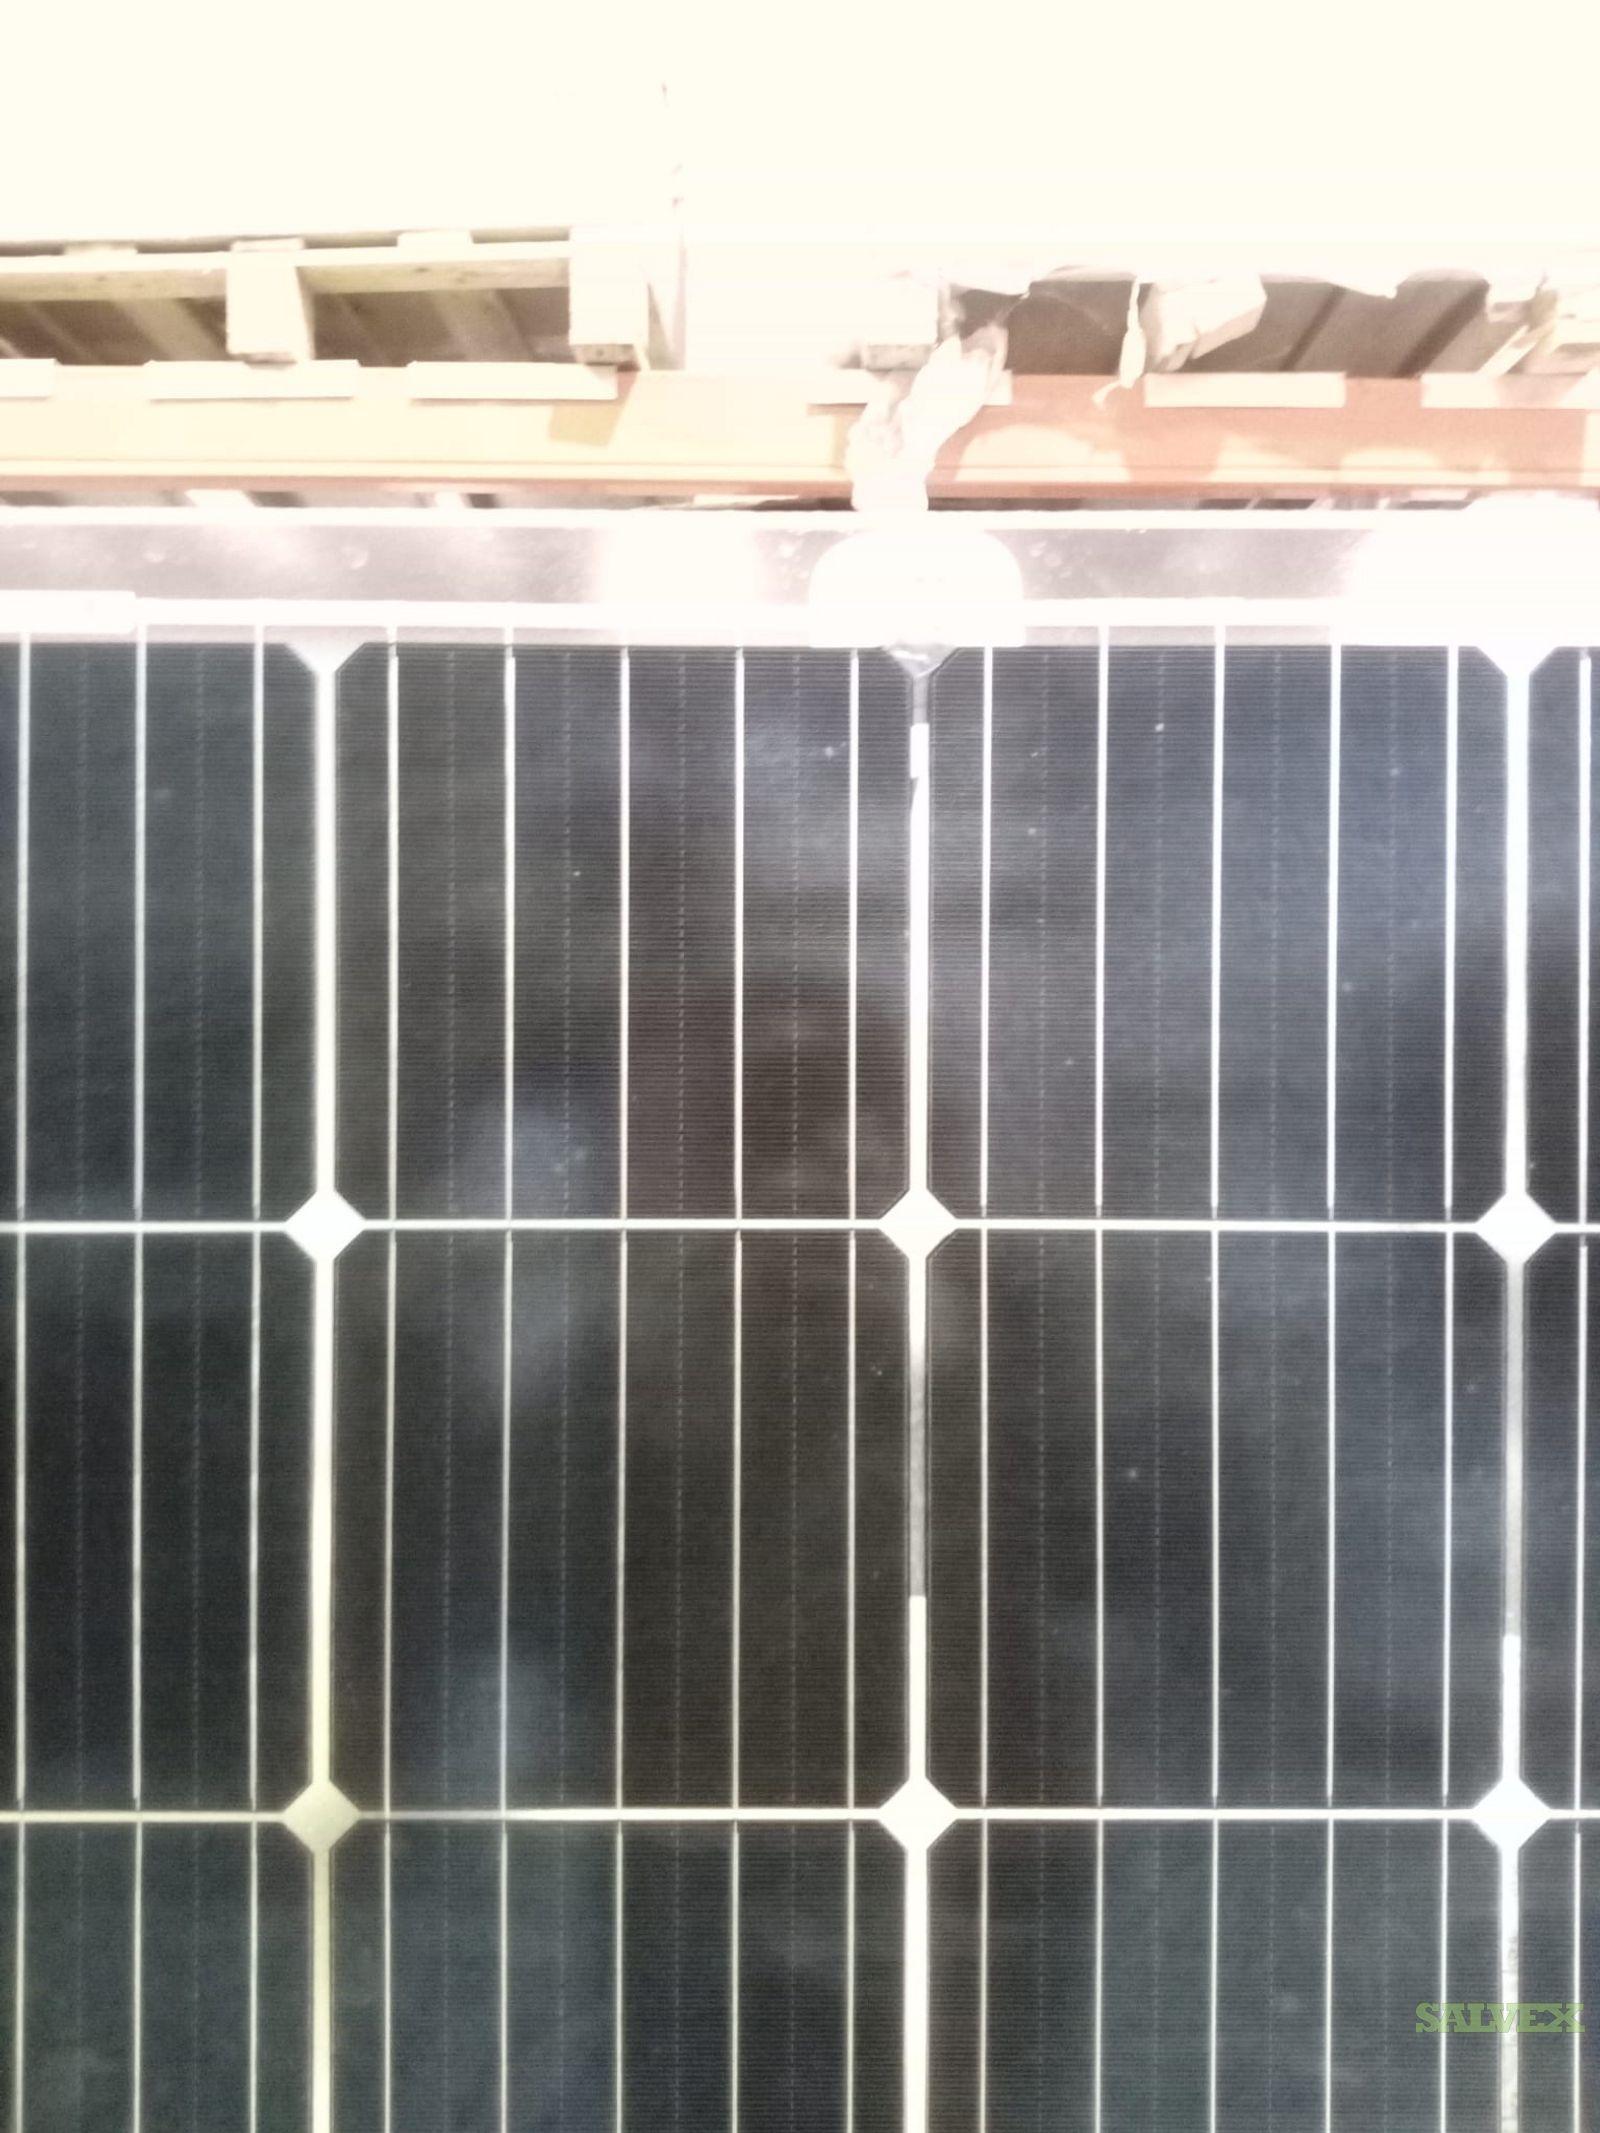 Sunerg 295W Solar Panels - B Grade (579 Modules)